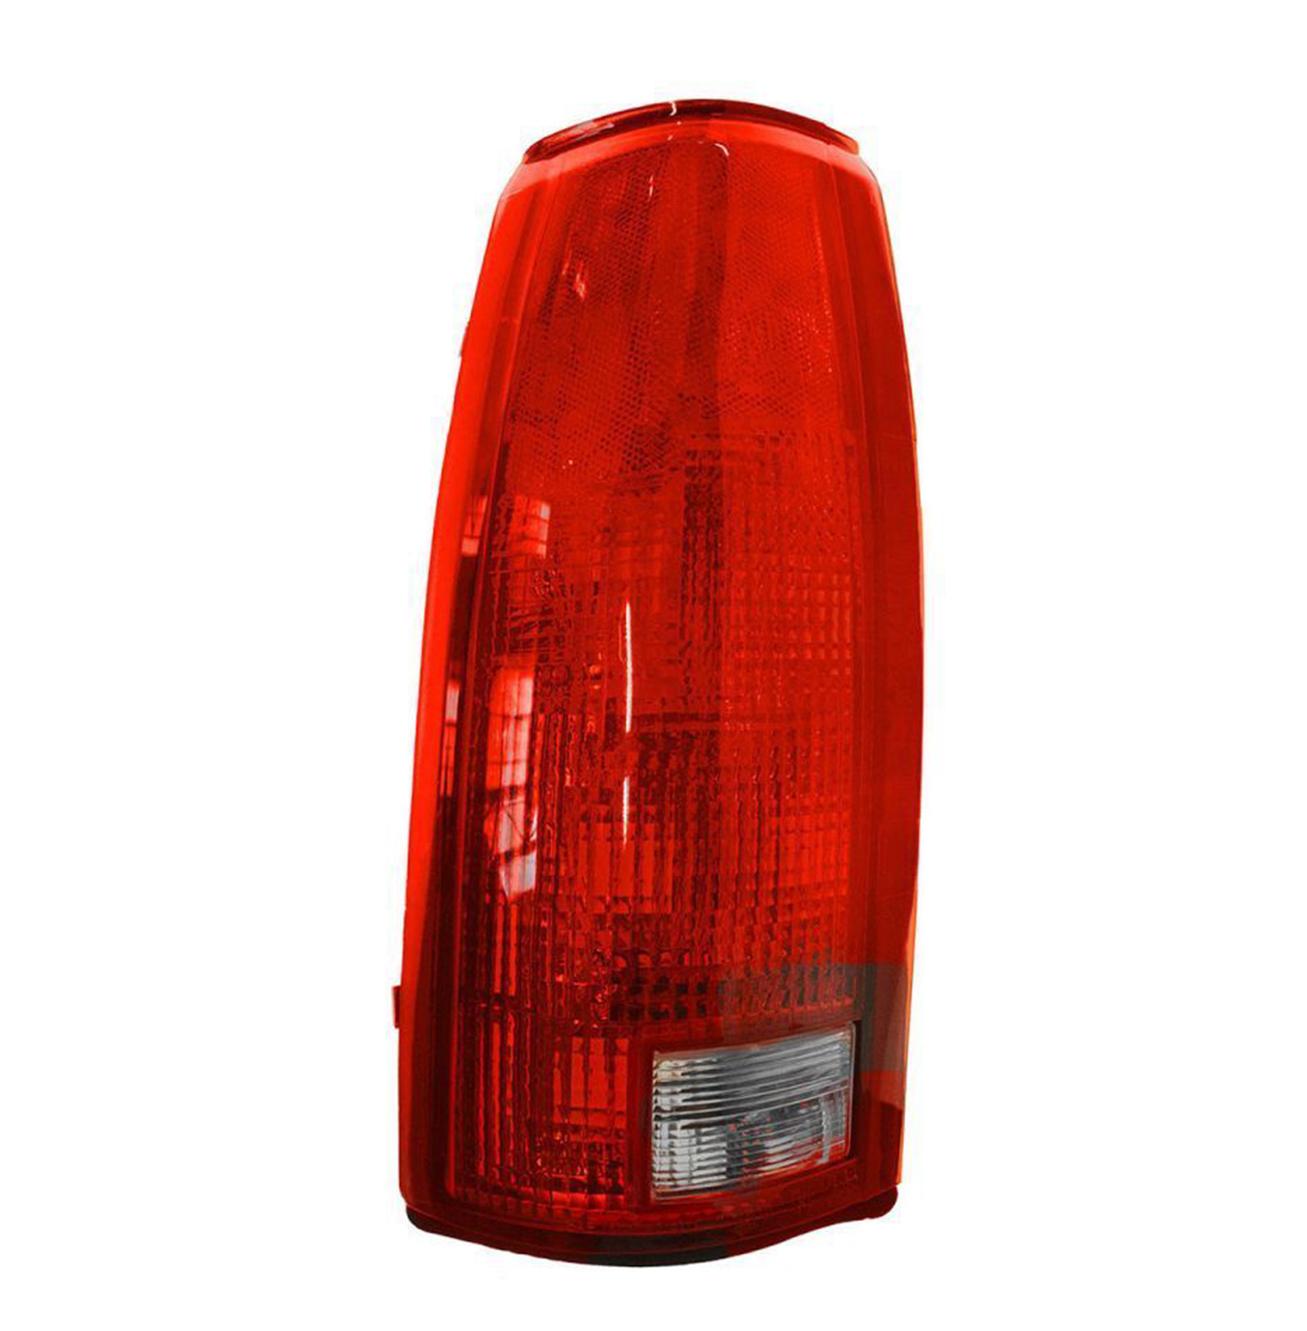 Newer Vehicle Tail Light Lenses : New left tail light lens and housing fit gmc yukon gt sl